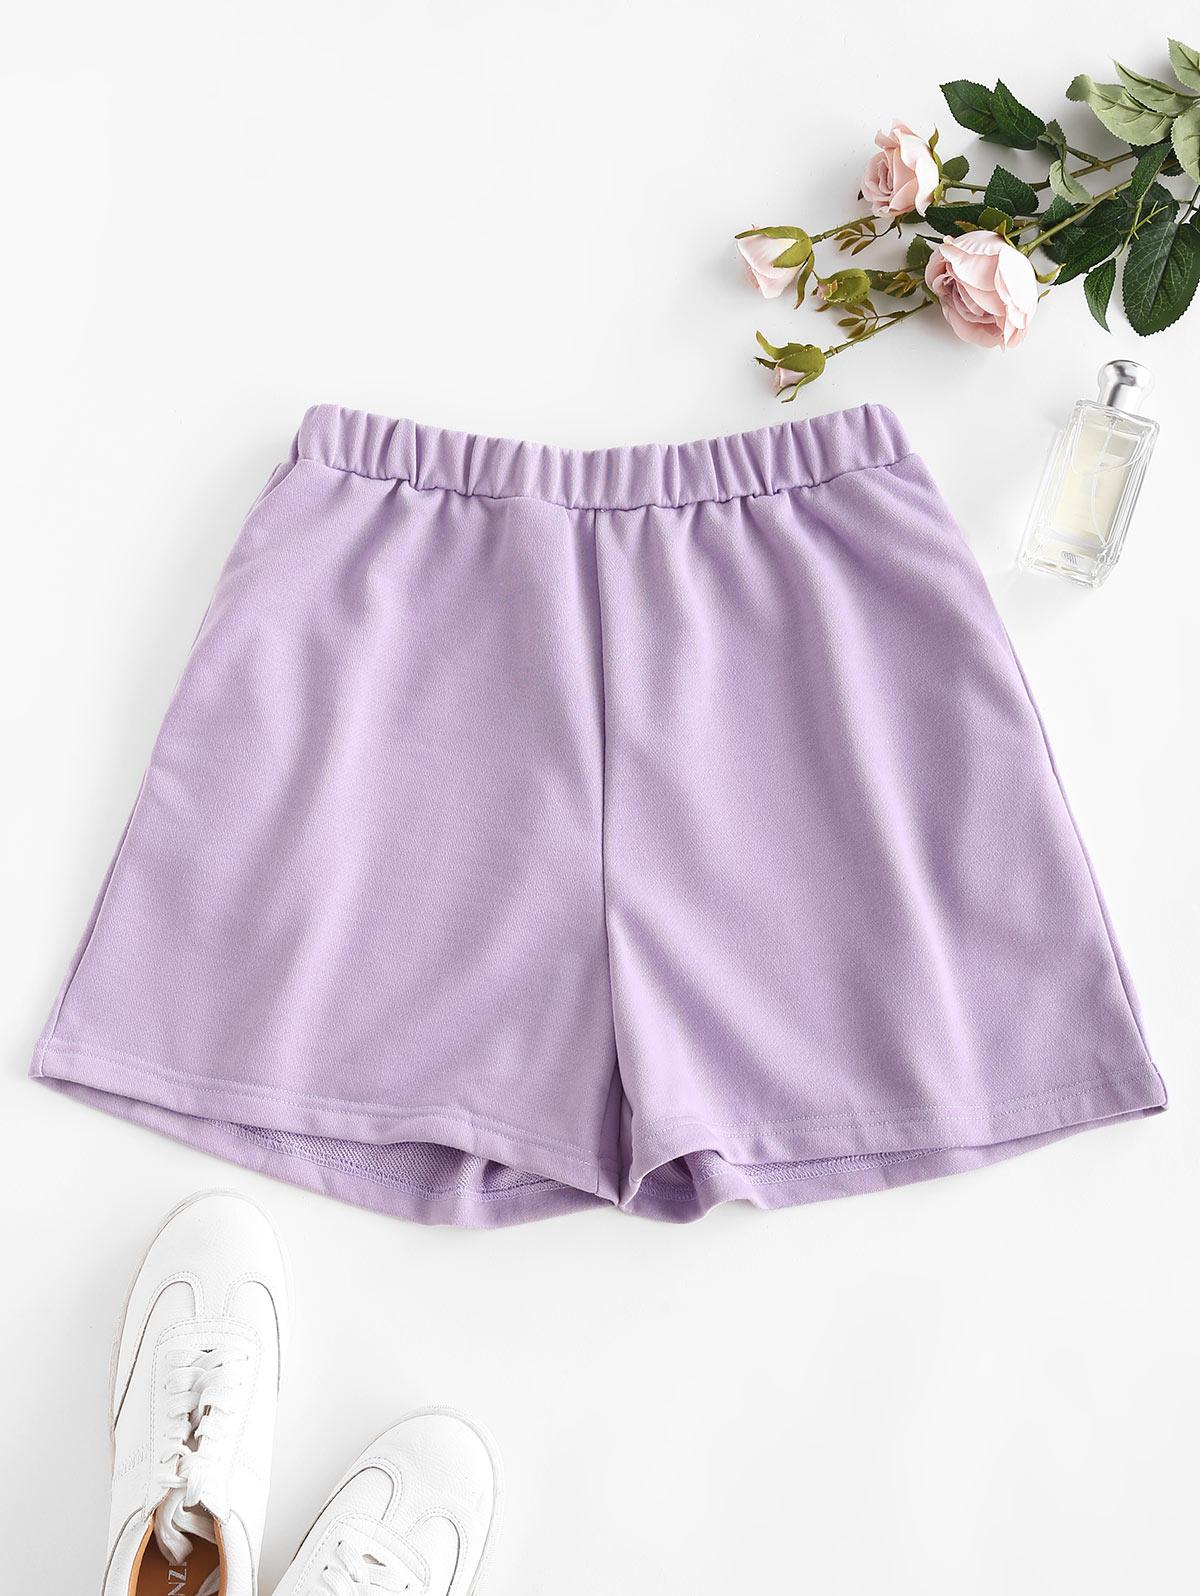 Pocket High Waisted Loose Shorts